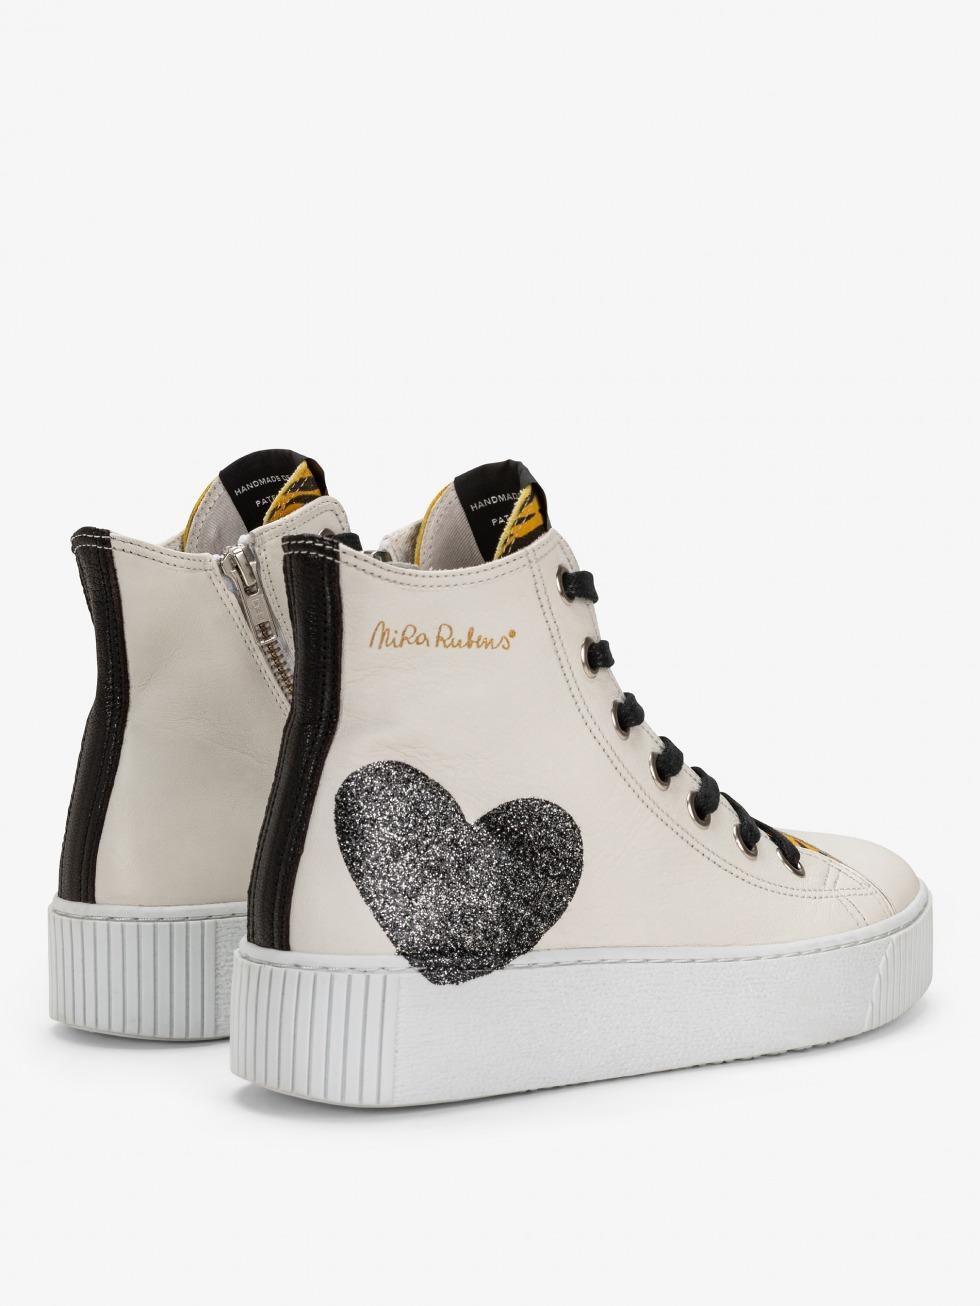 Long Island Sneakers - Tiger Heart